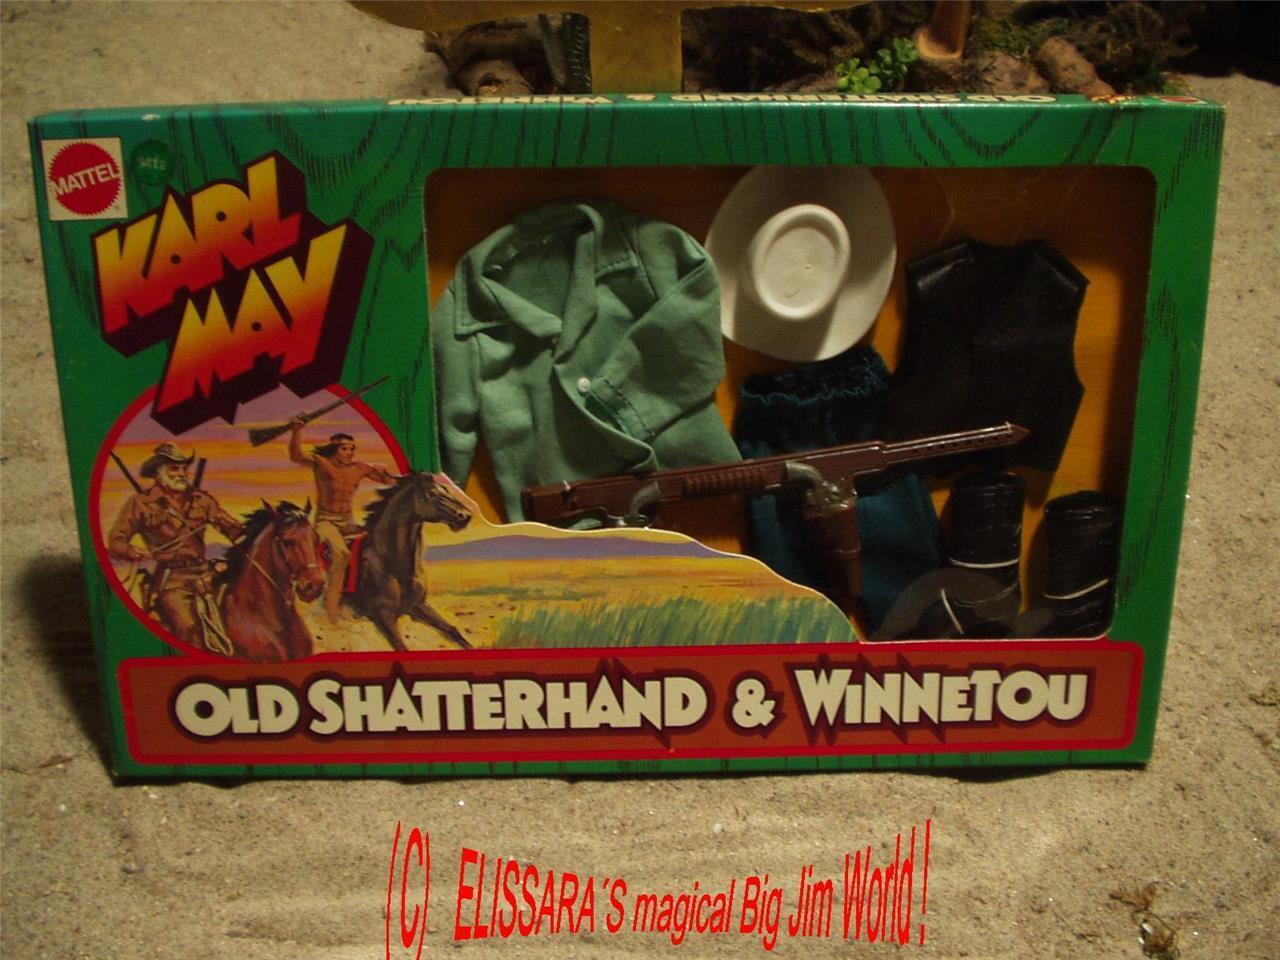 Big Jim - Karl May Winnetou - Western Outfit - TEXAS RANGER   MIB Box - OVP 9412